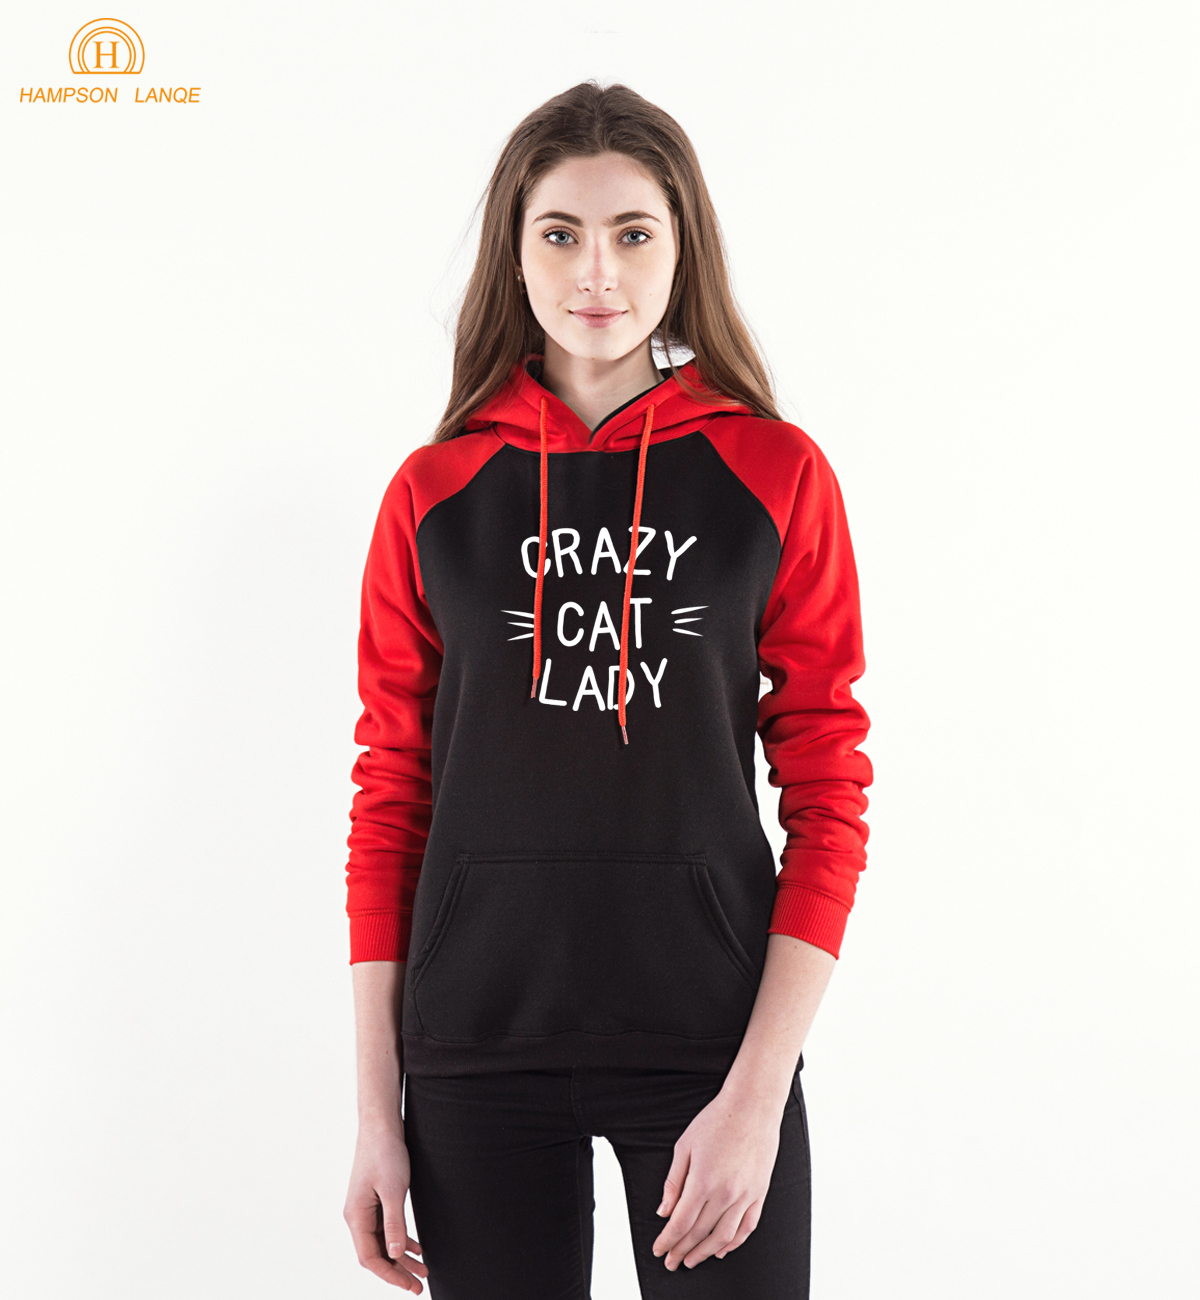 Kawaii Crazy Cat Lady Long Sleeve Hooded Women 2019 New Spring Autumn Casual Sweatshirts Hoodies Warm Kpop Hoodie Cute Pullovers